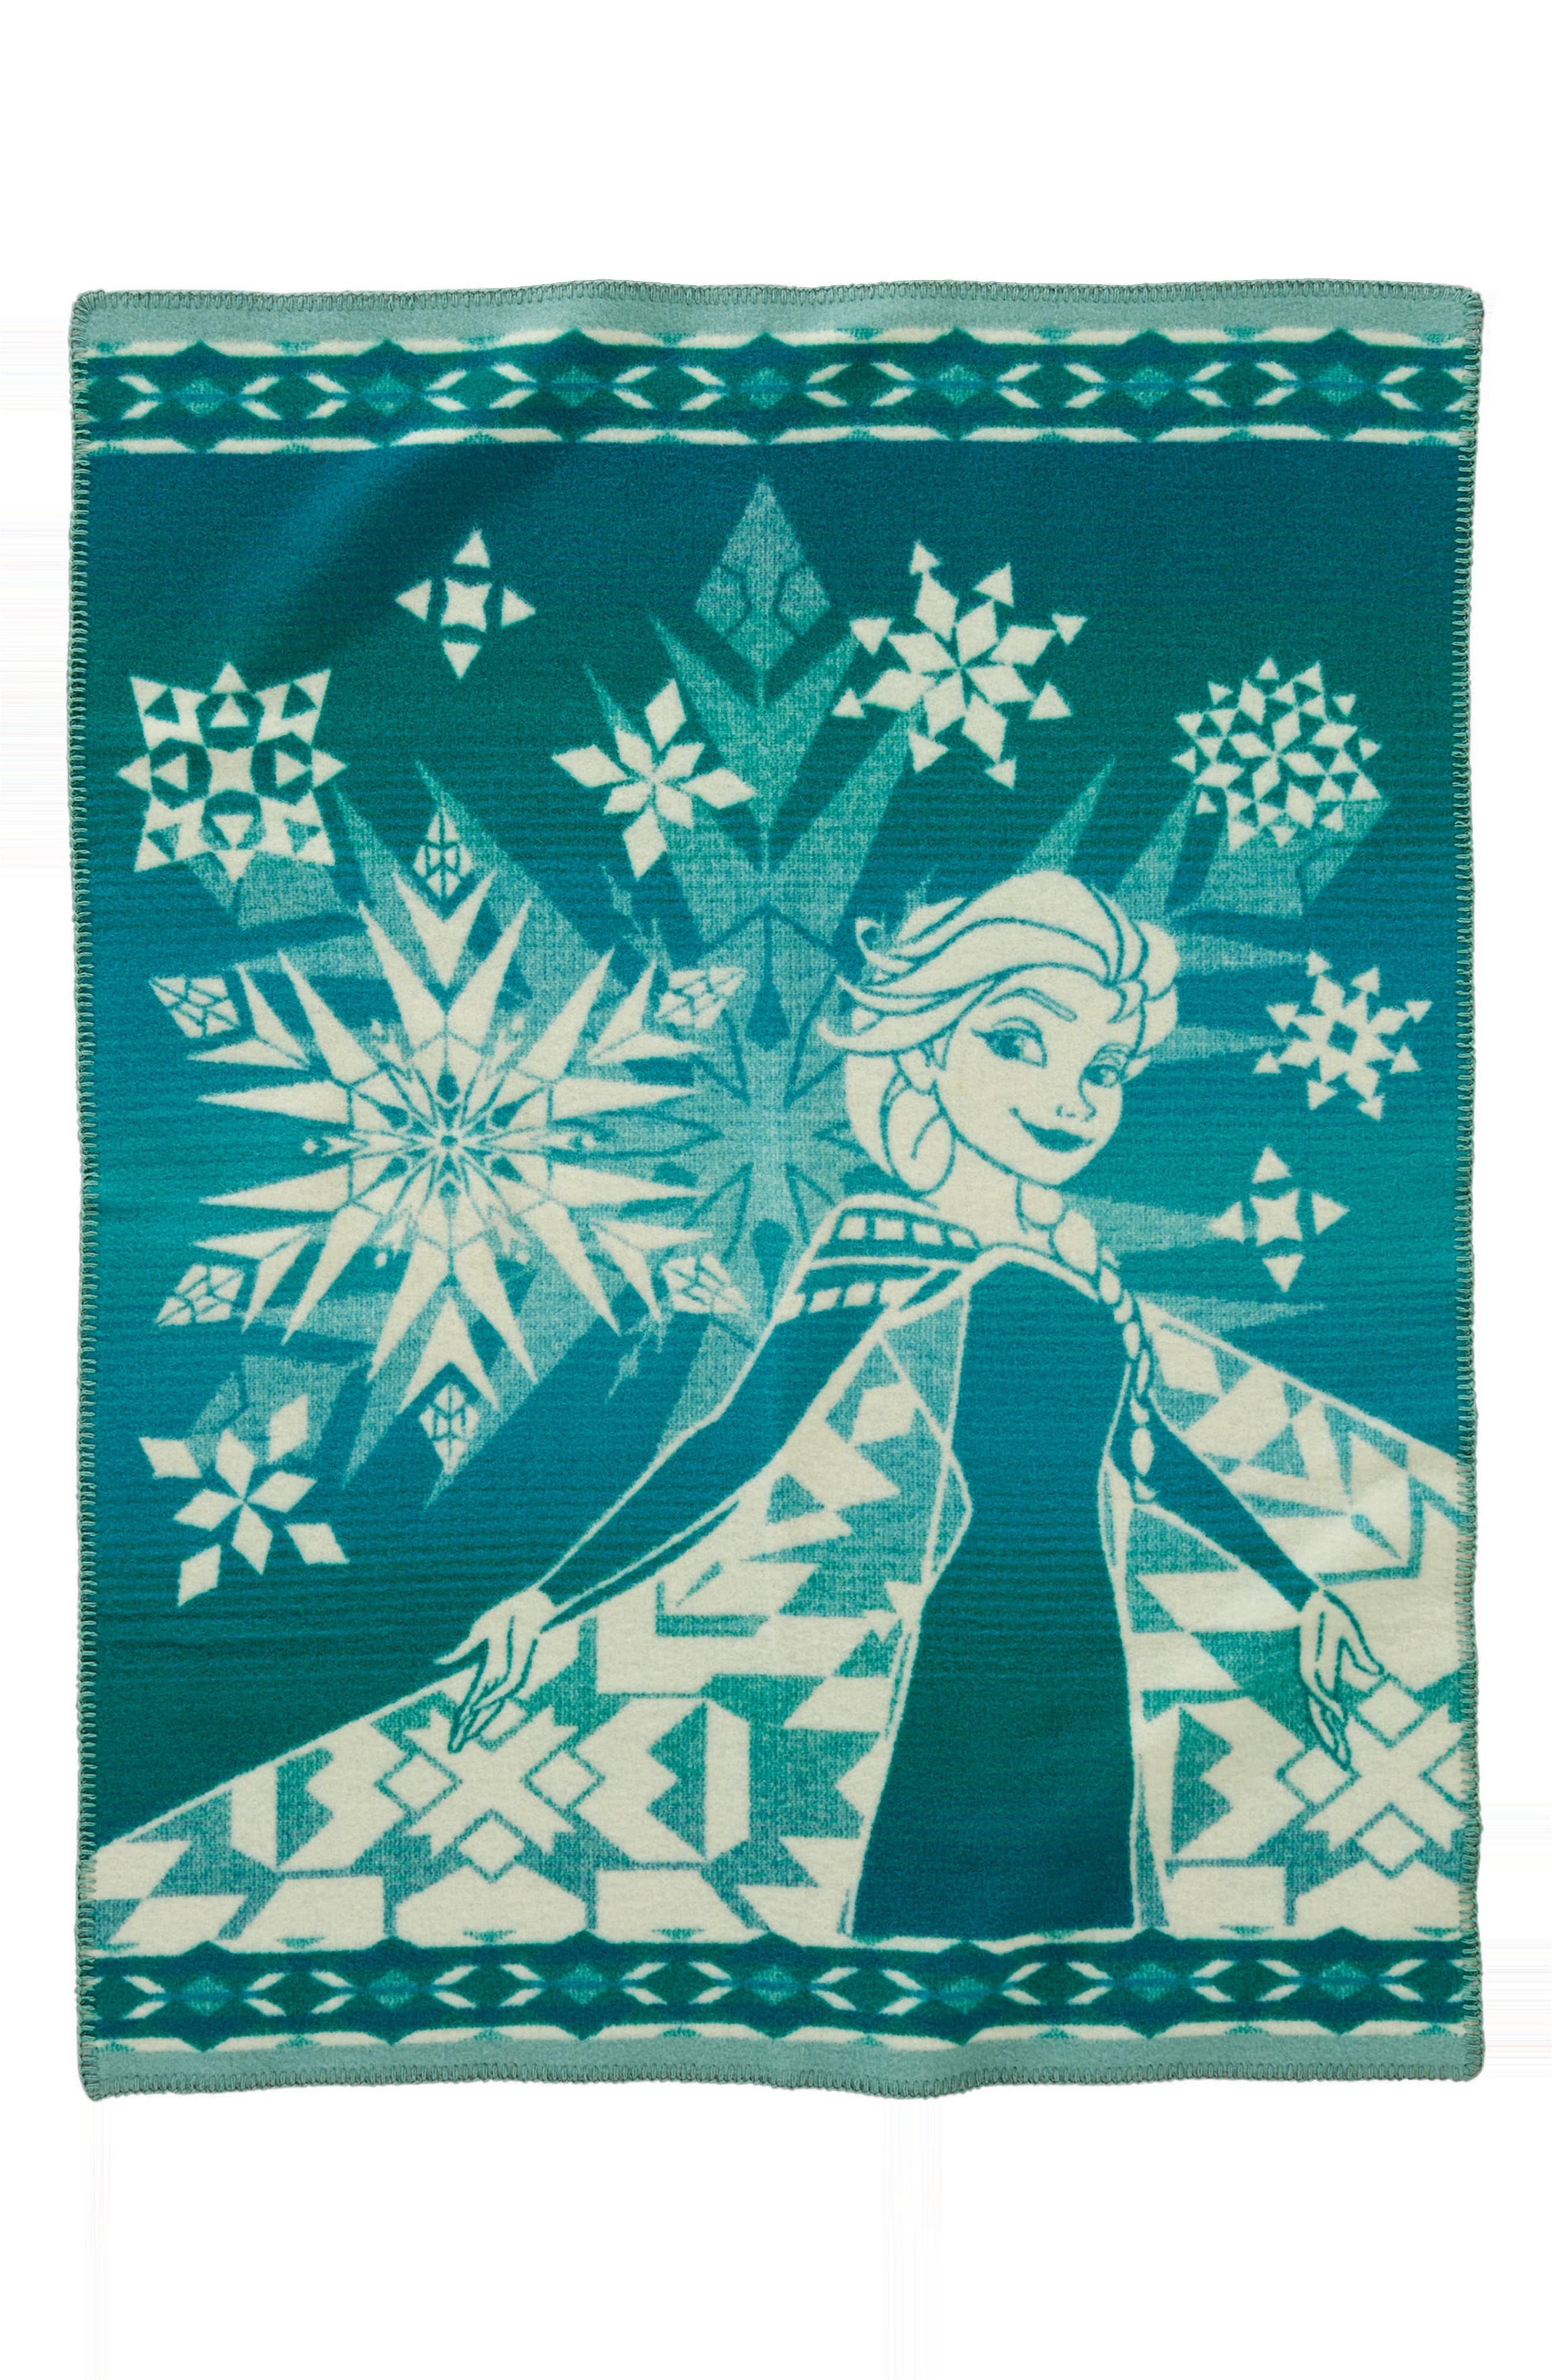 Elsa's Courage Blanket Throw,                         Main,                         color, Green